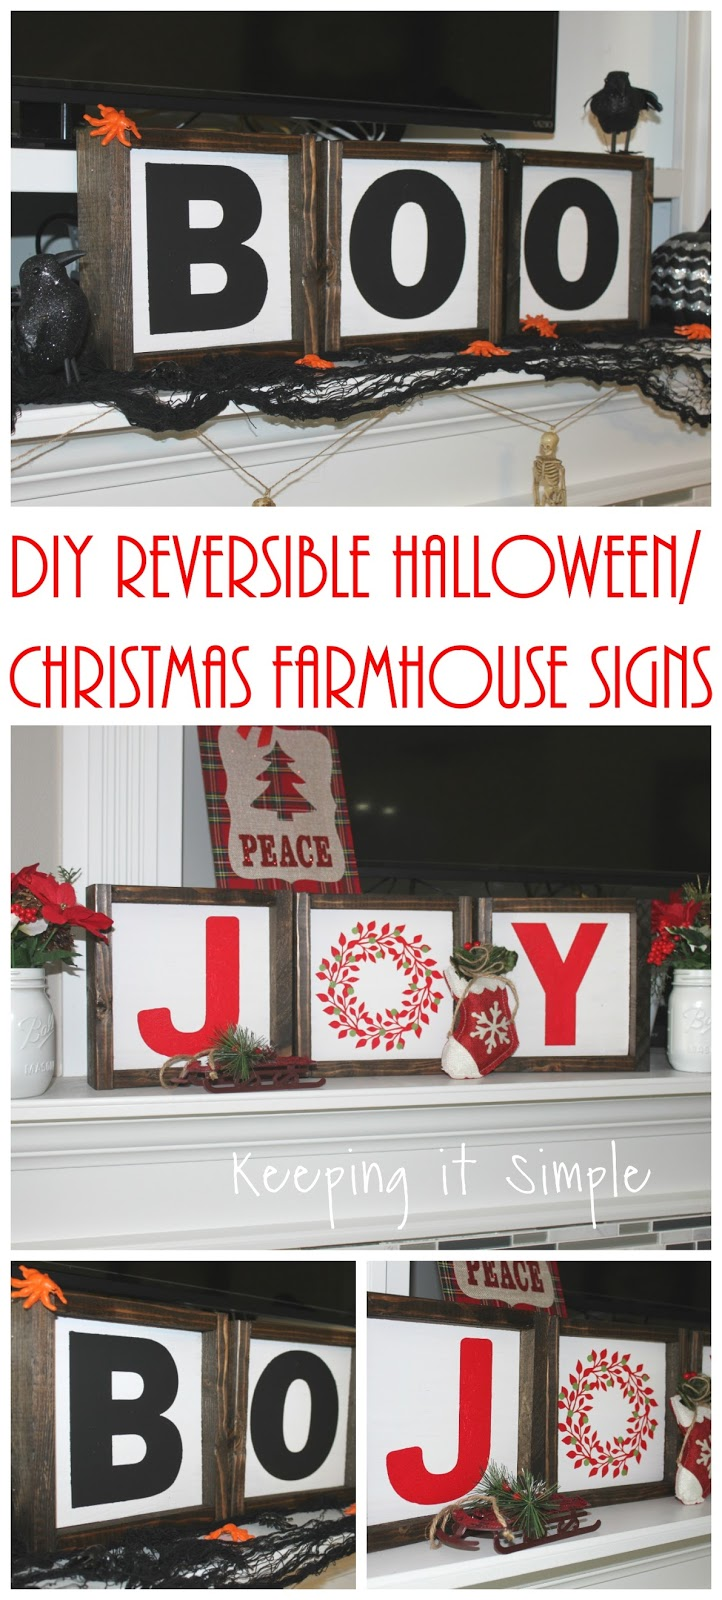 DIY Reversible Halloween/Christmas Farmhouse Signs • Keeping it Simple